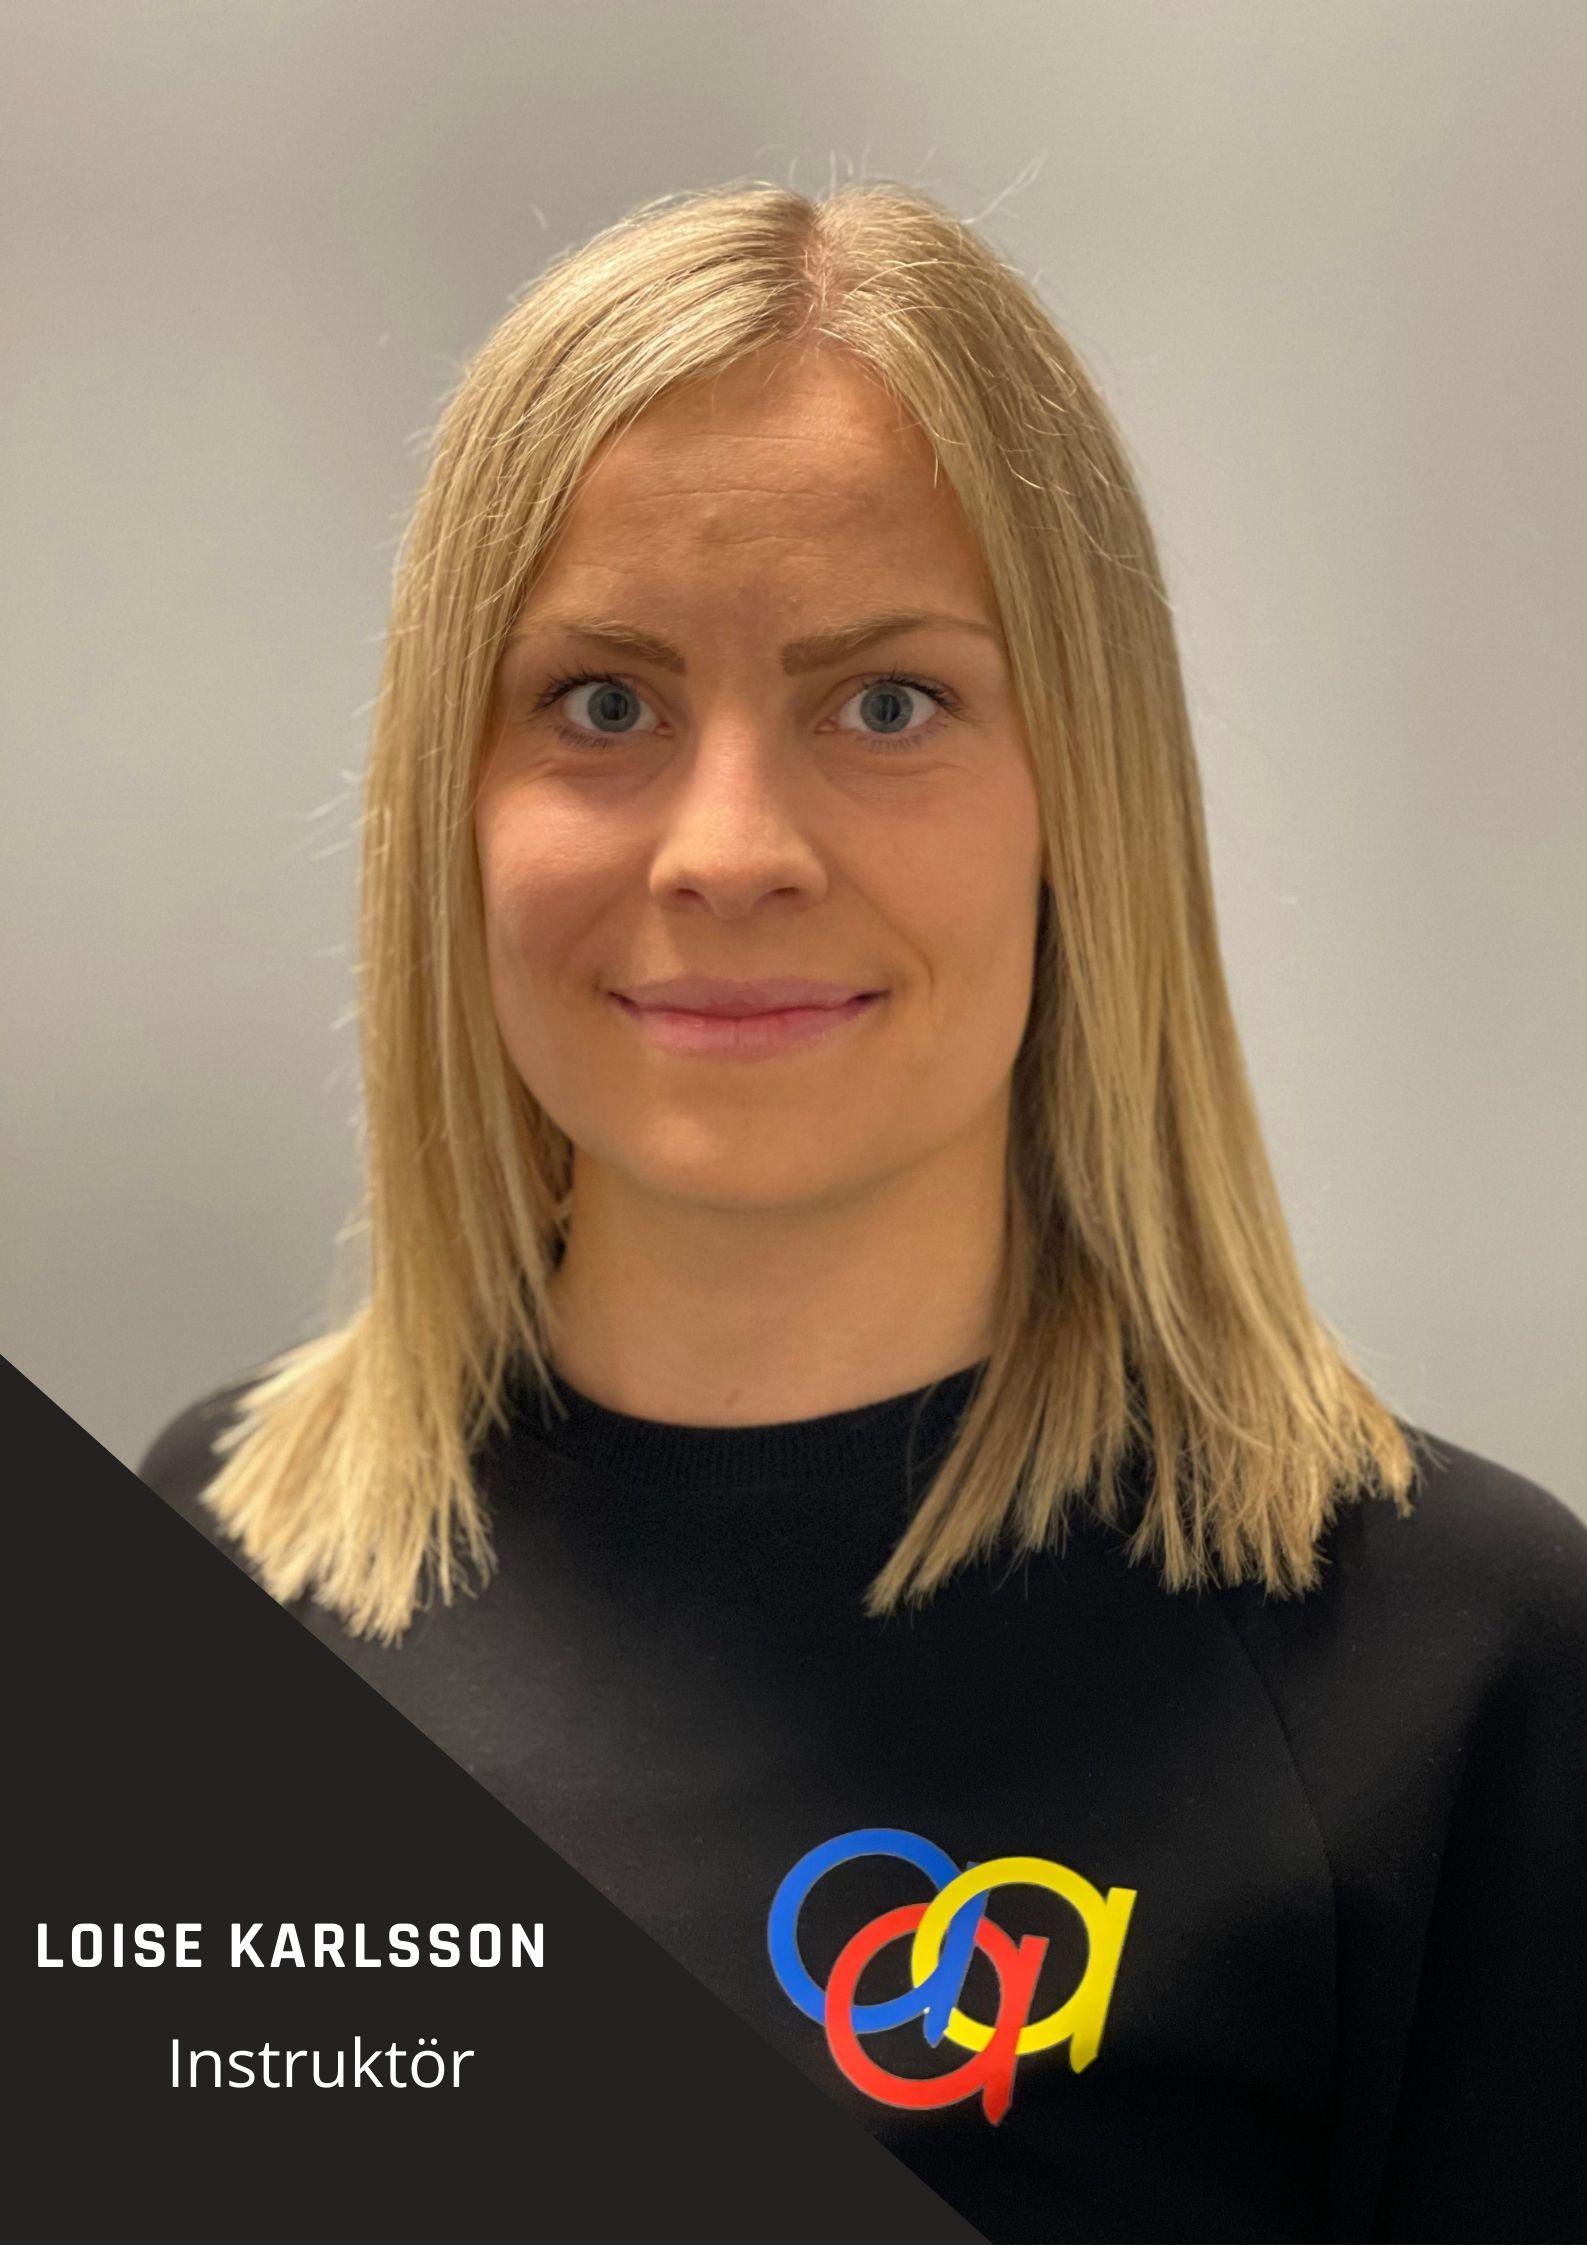 Loise Karlsson